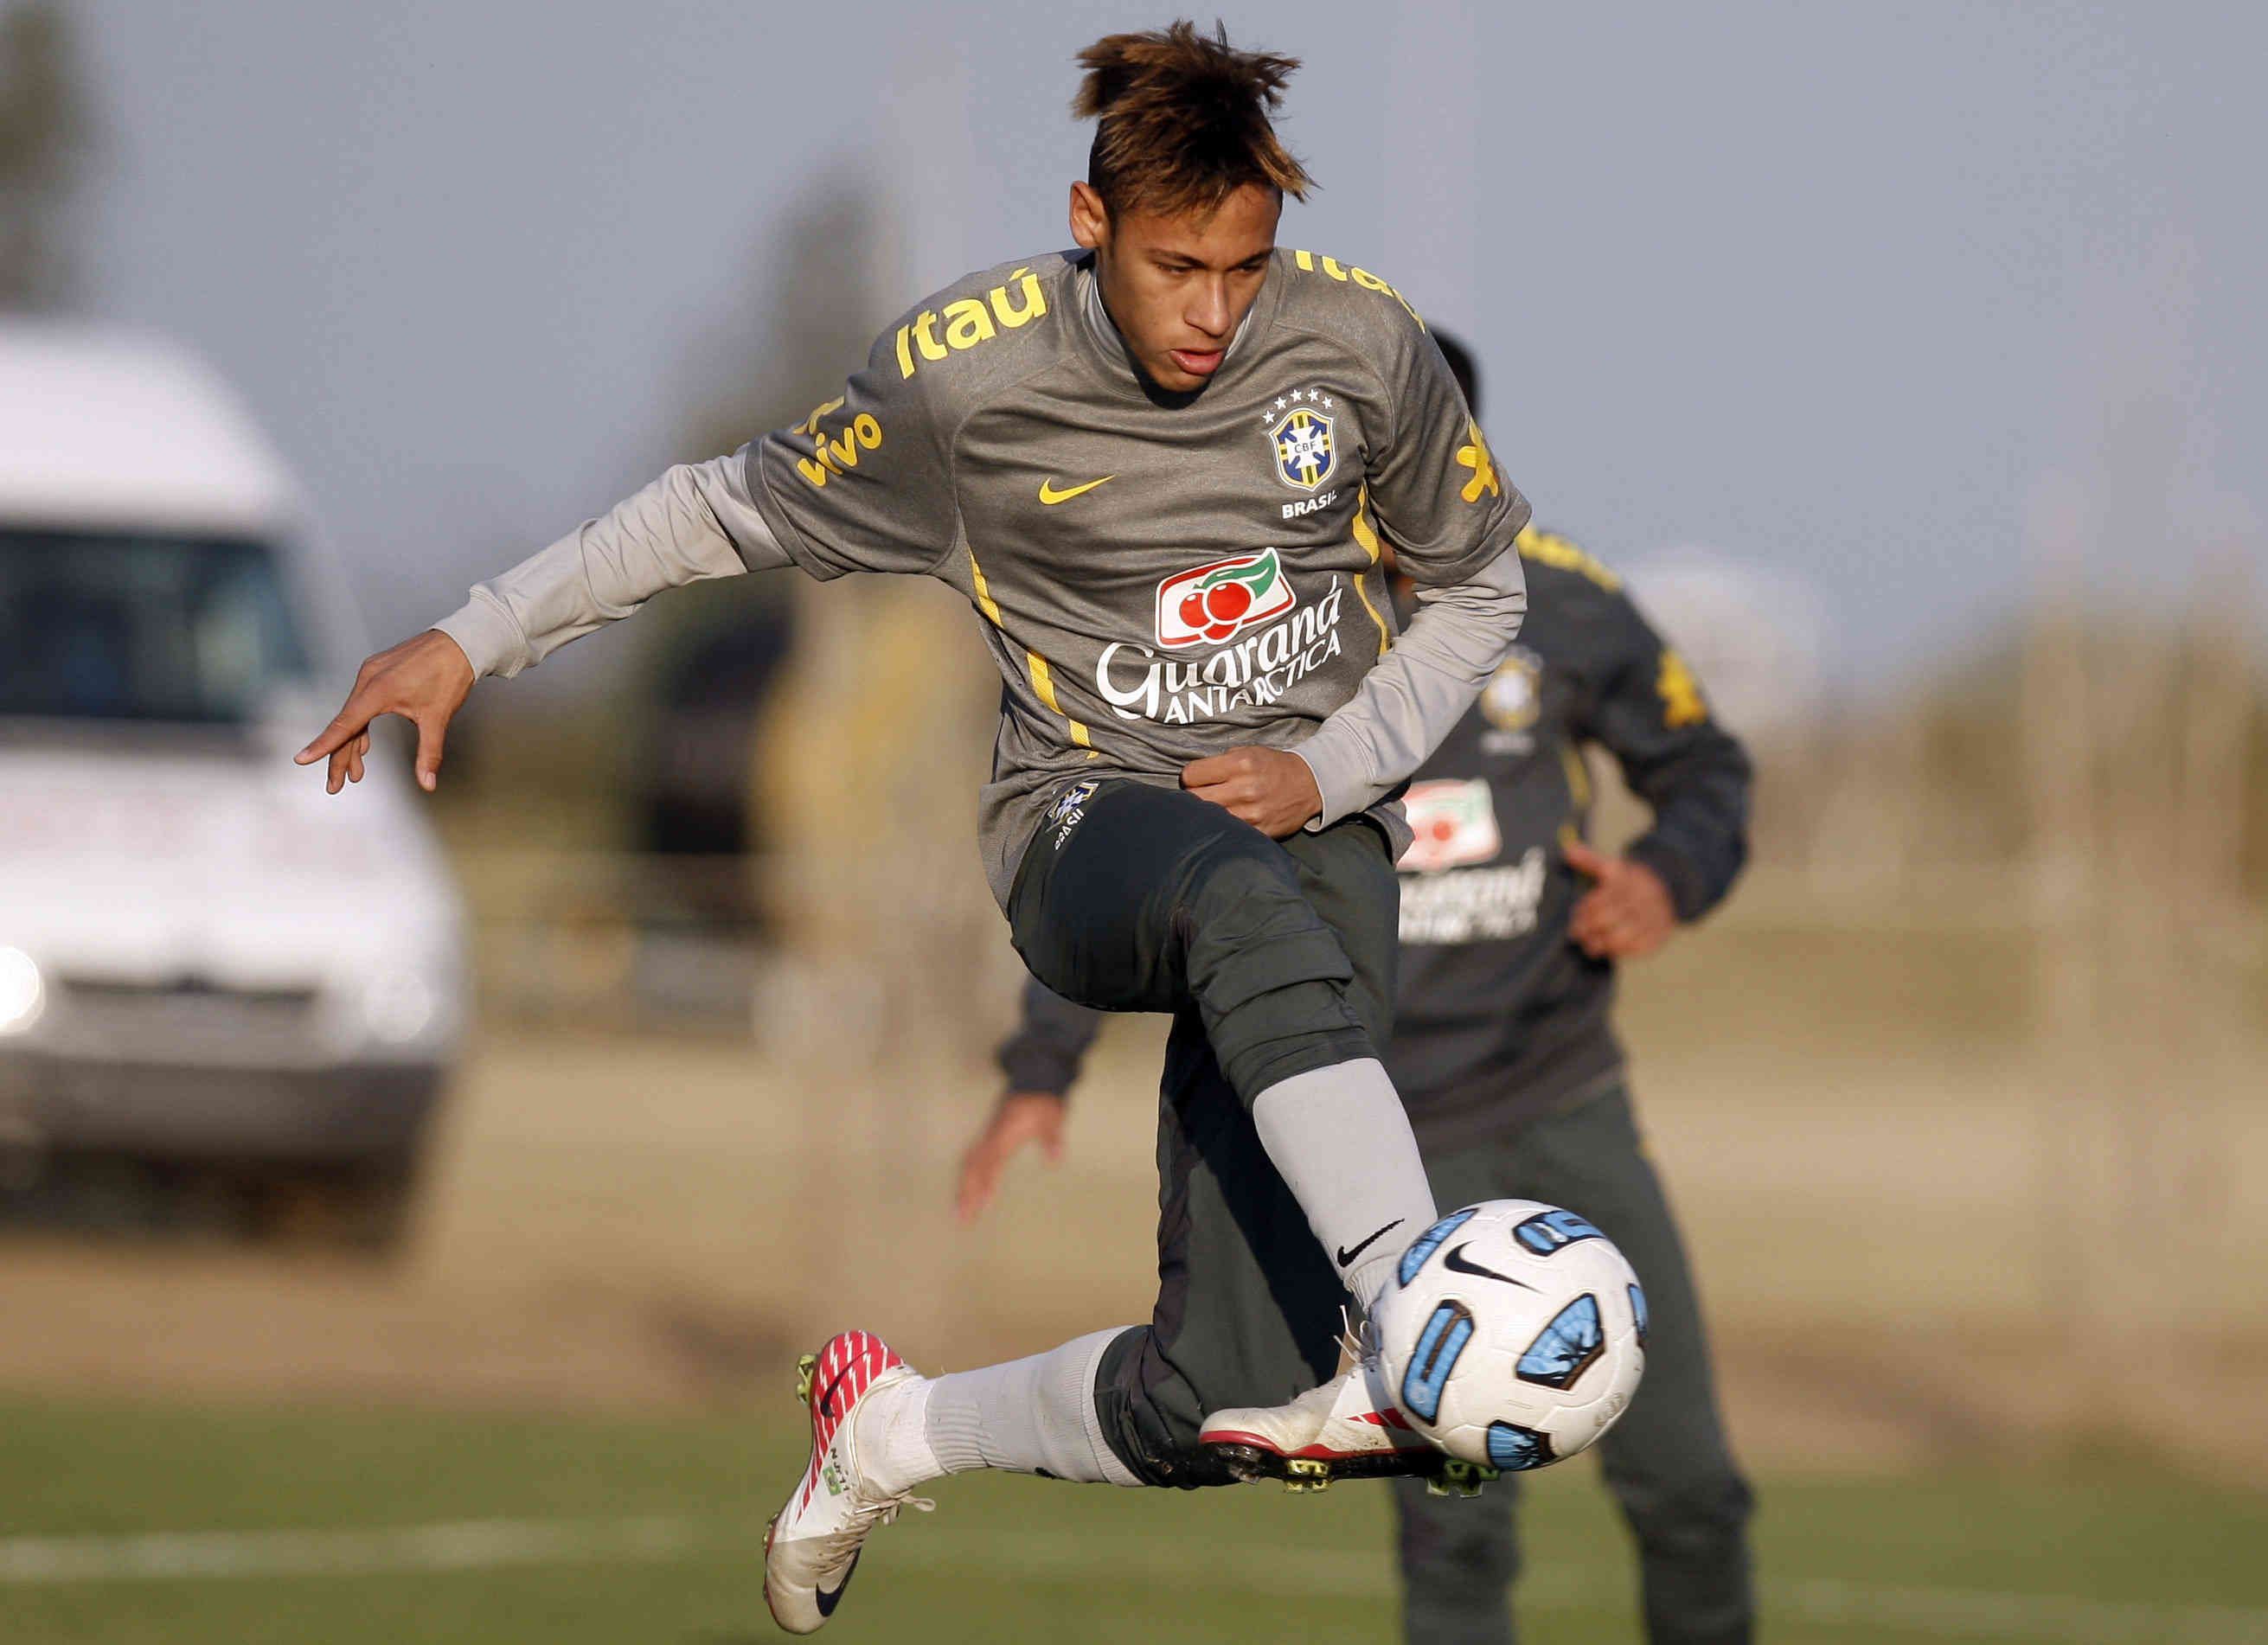 Hd wallpaper neymar - Neymar Hd Image Copa America Brazil 2622 1902 Http Nirhara Com